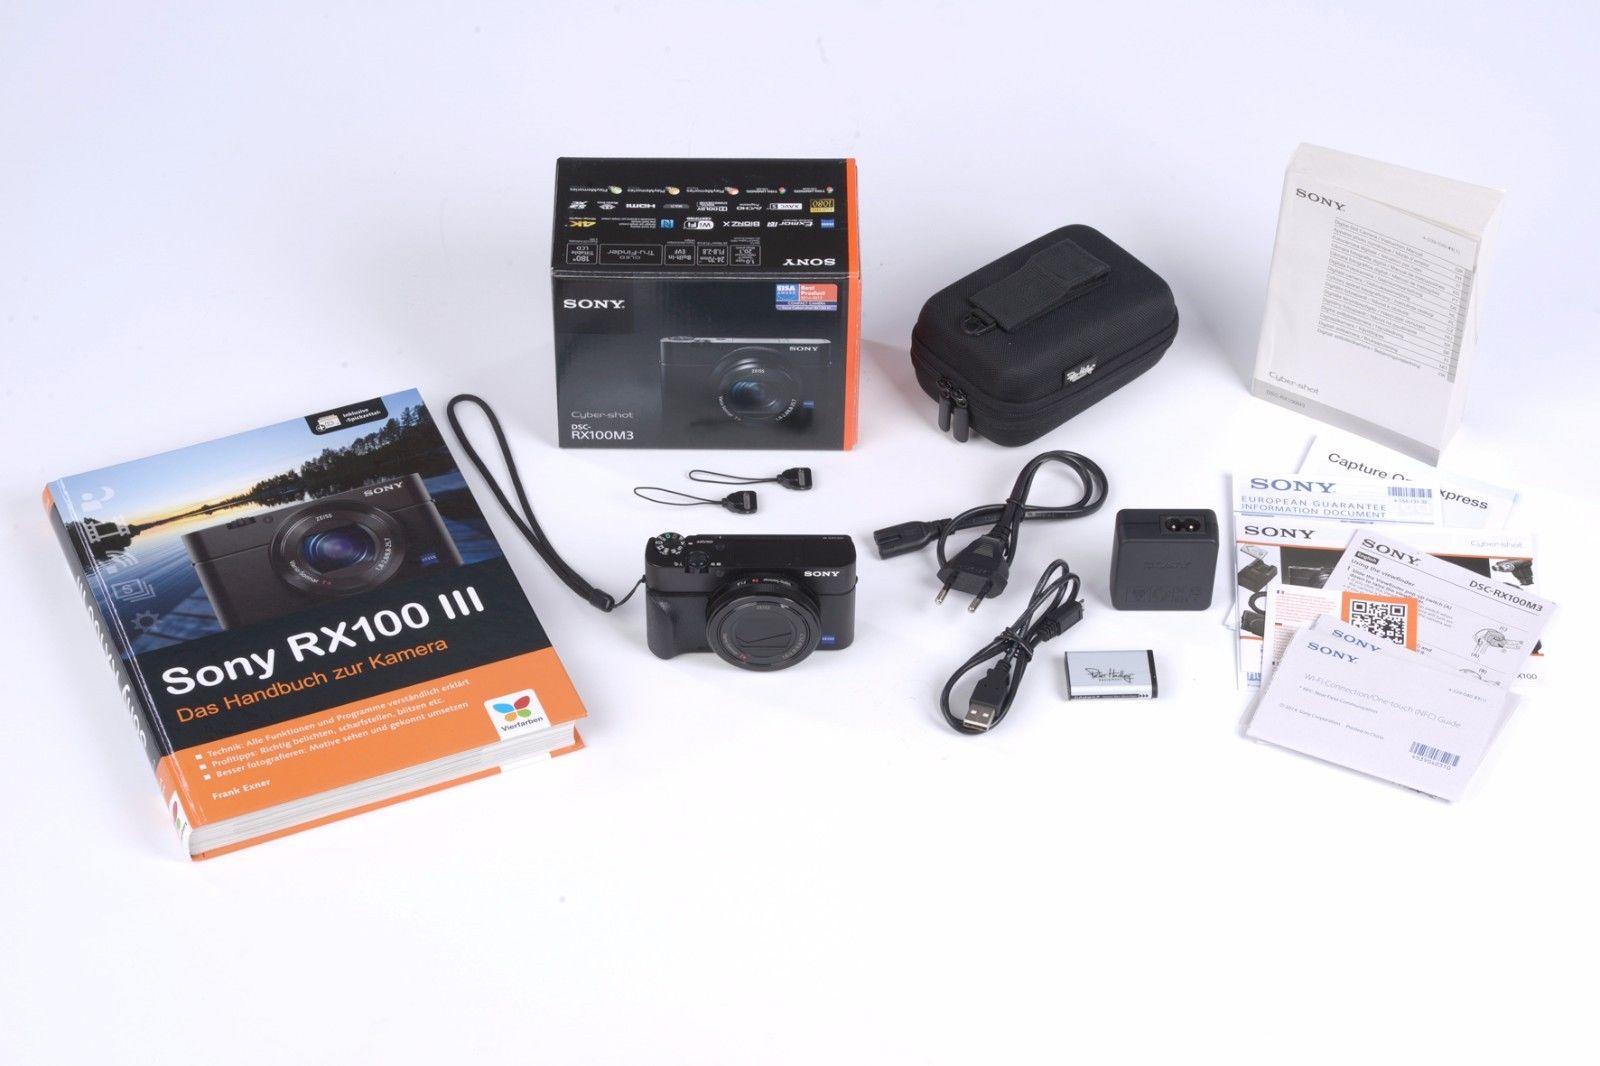 Sony Cyber-shot RX100 III 20,1 MP Digitalkamera - Schwarz (Kit mit Carl Zeiss Va